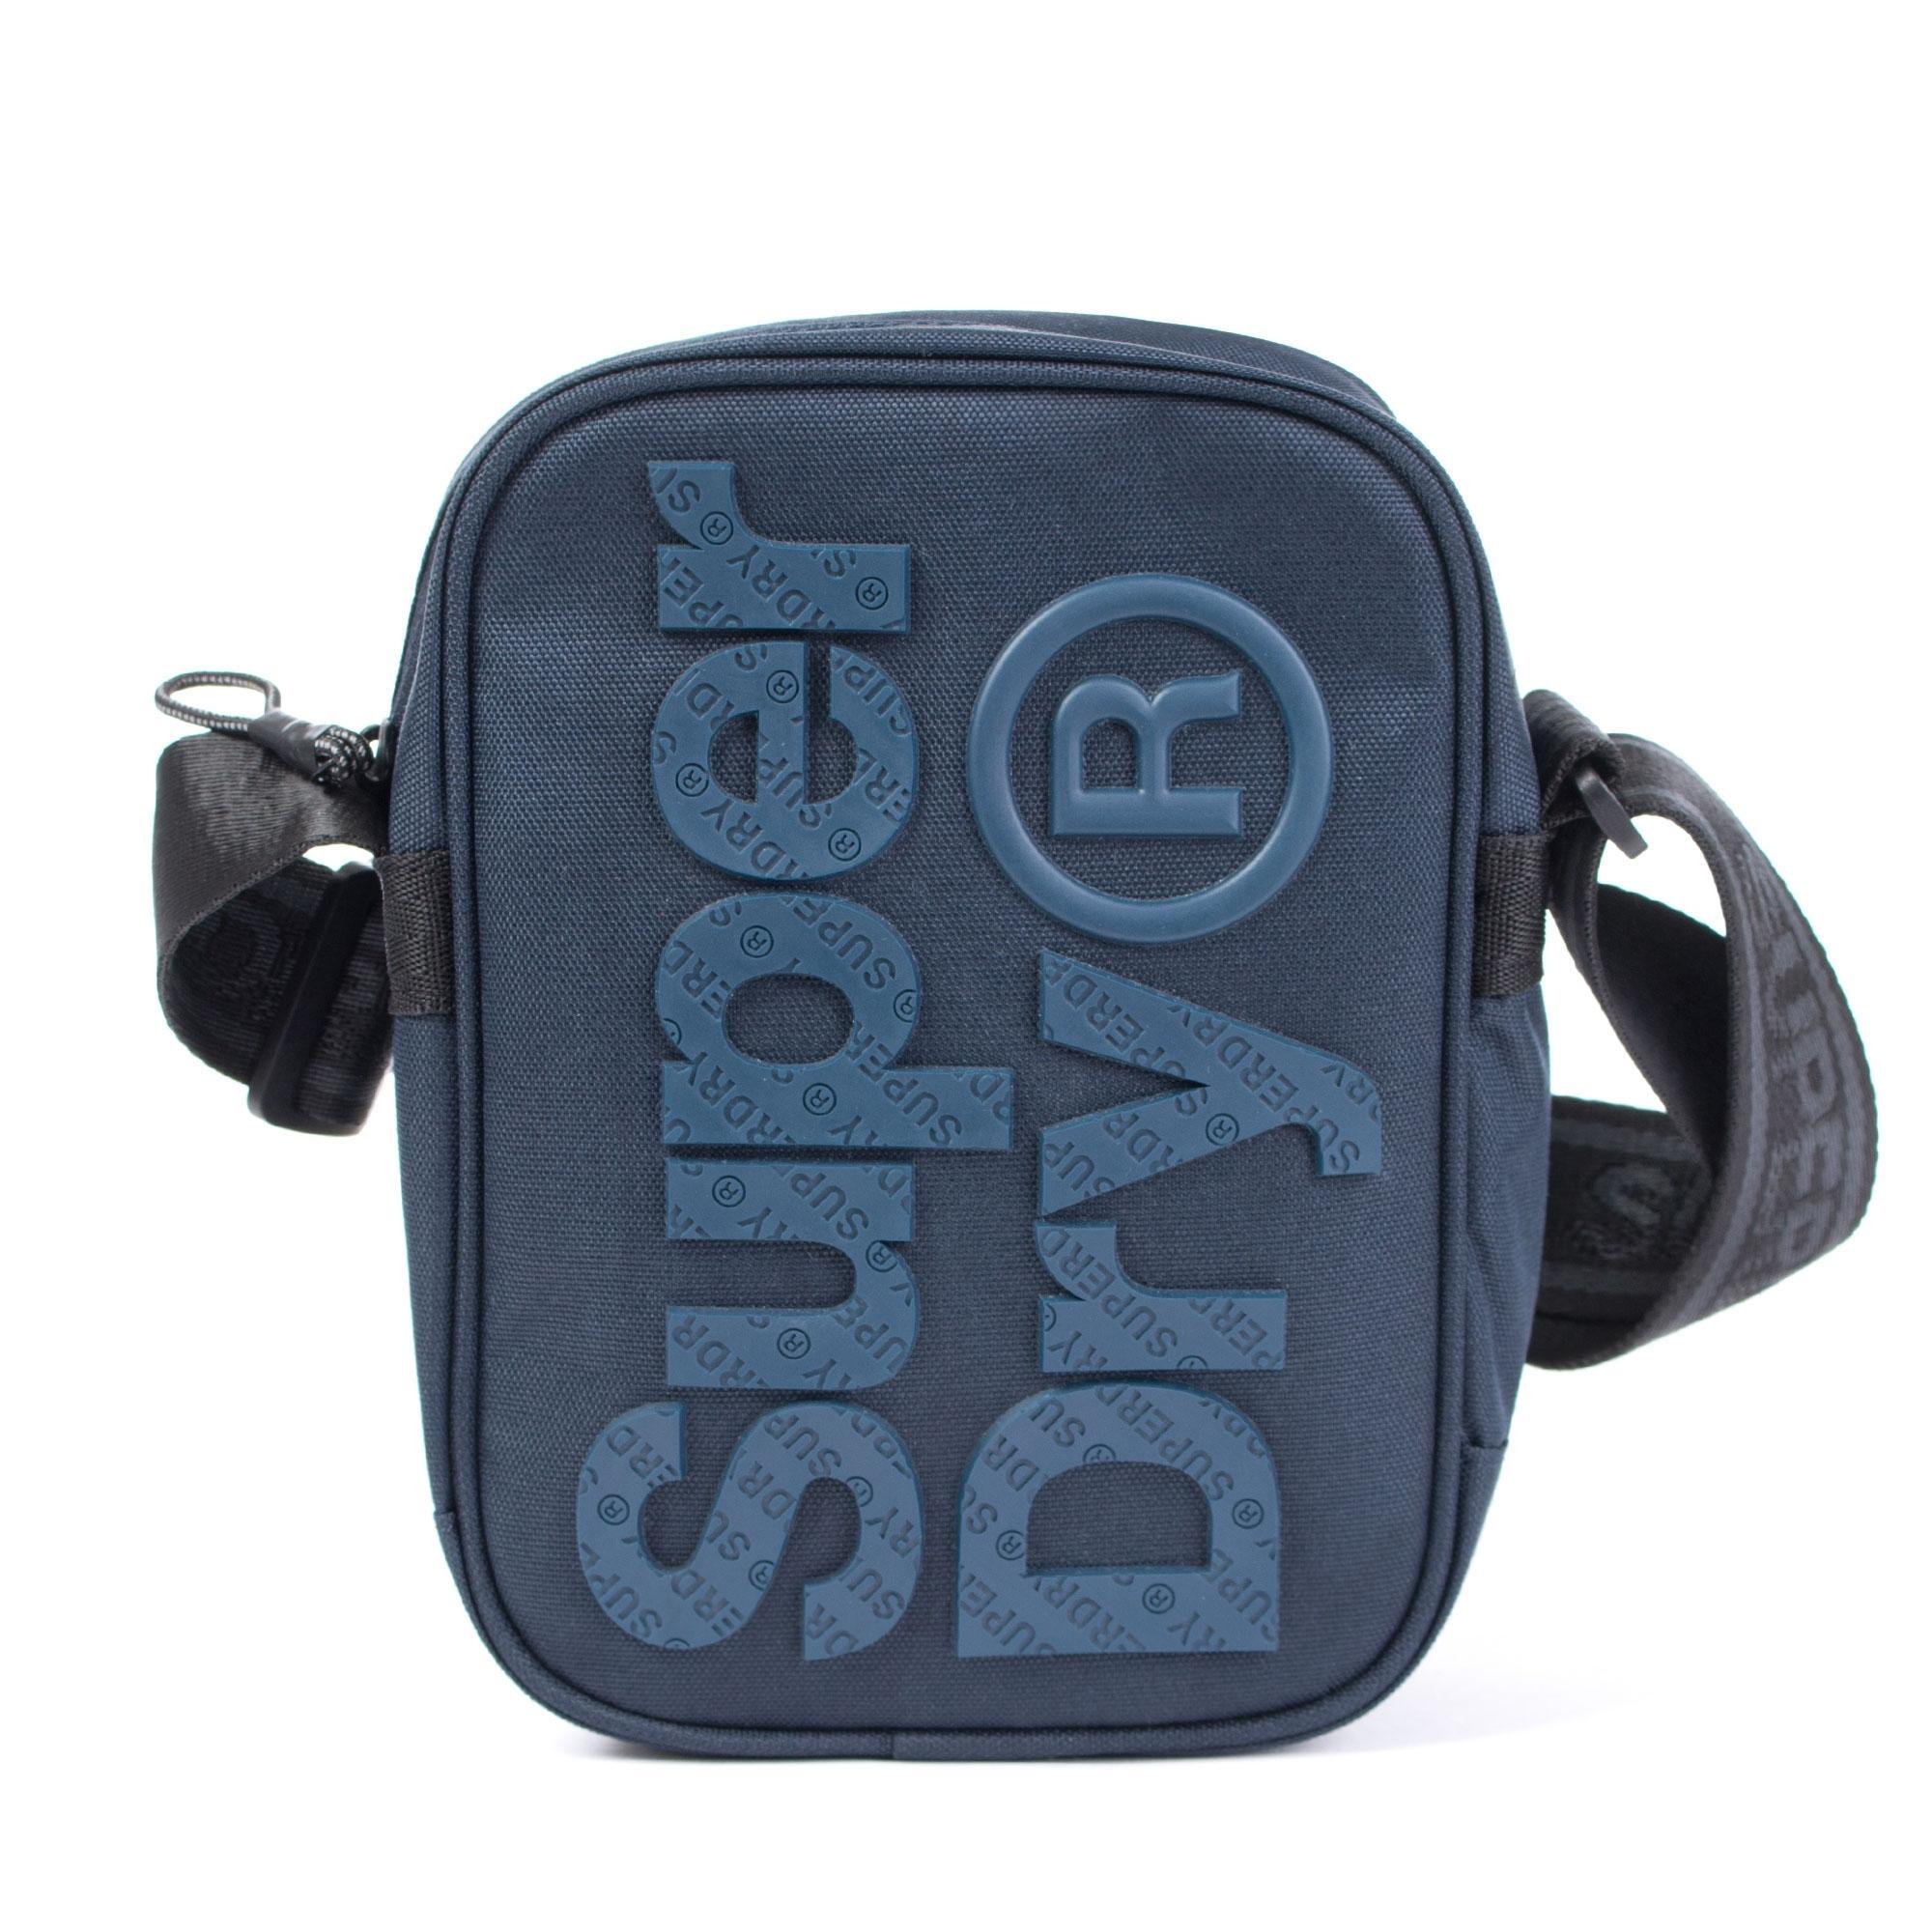 Superdry B Boy Festival Cross Body Sidebag Pouch Bag Navy